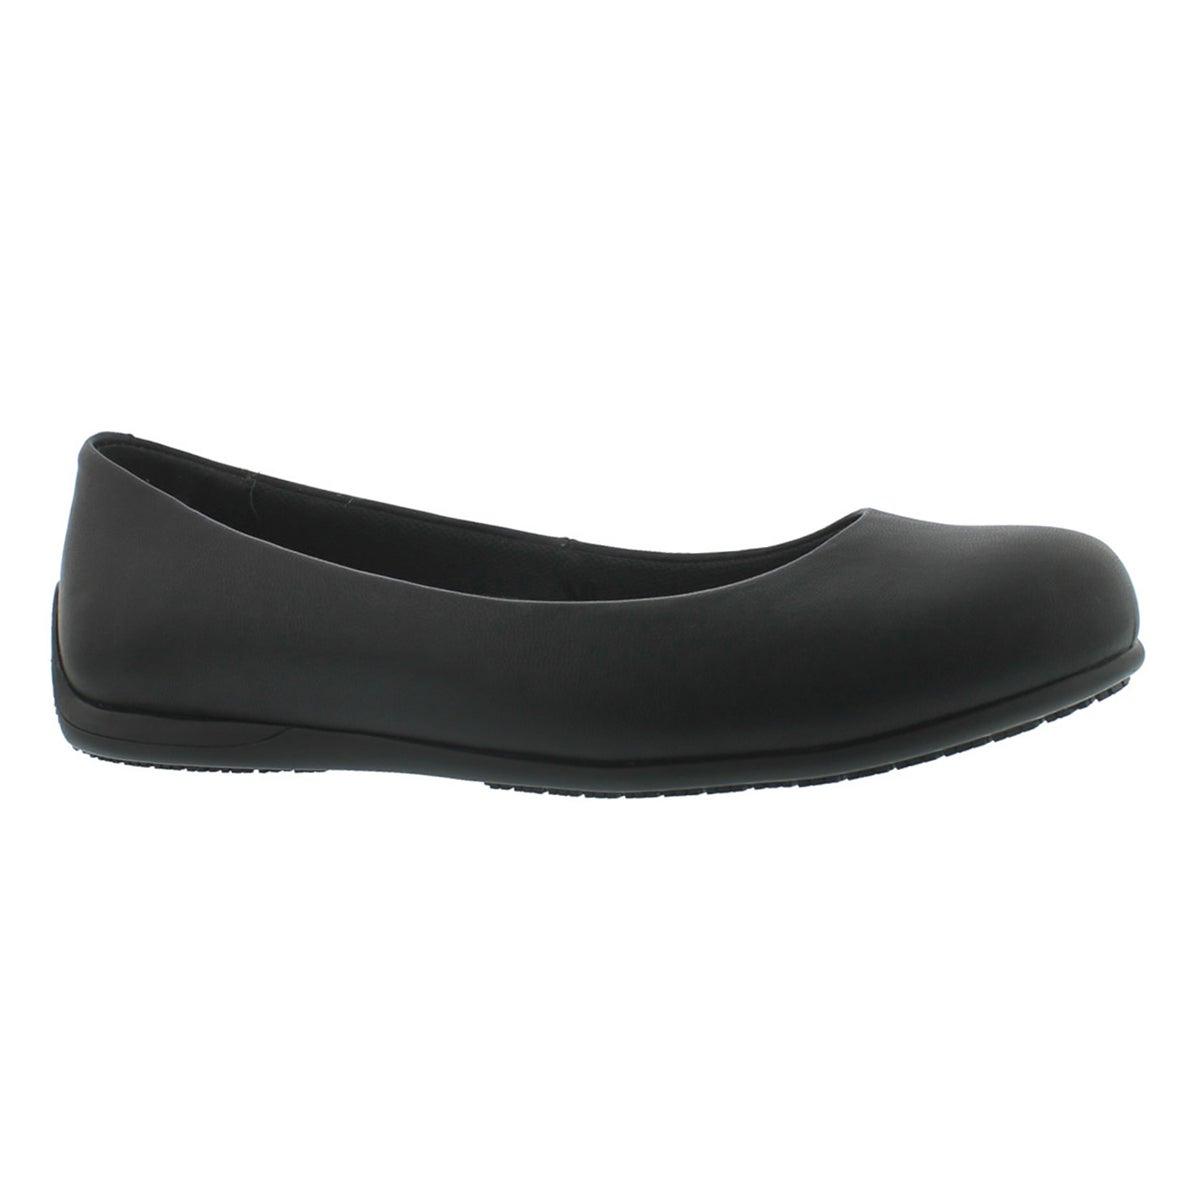 Women's TRANSPIRE black slip-resistant flats